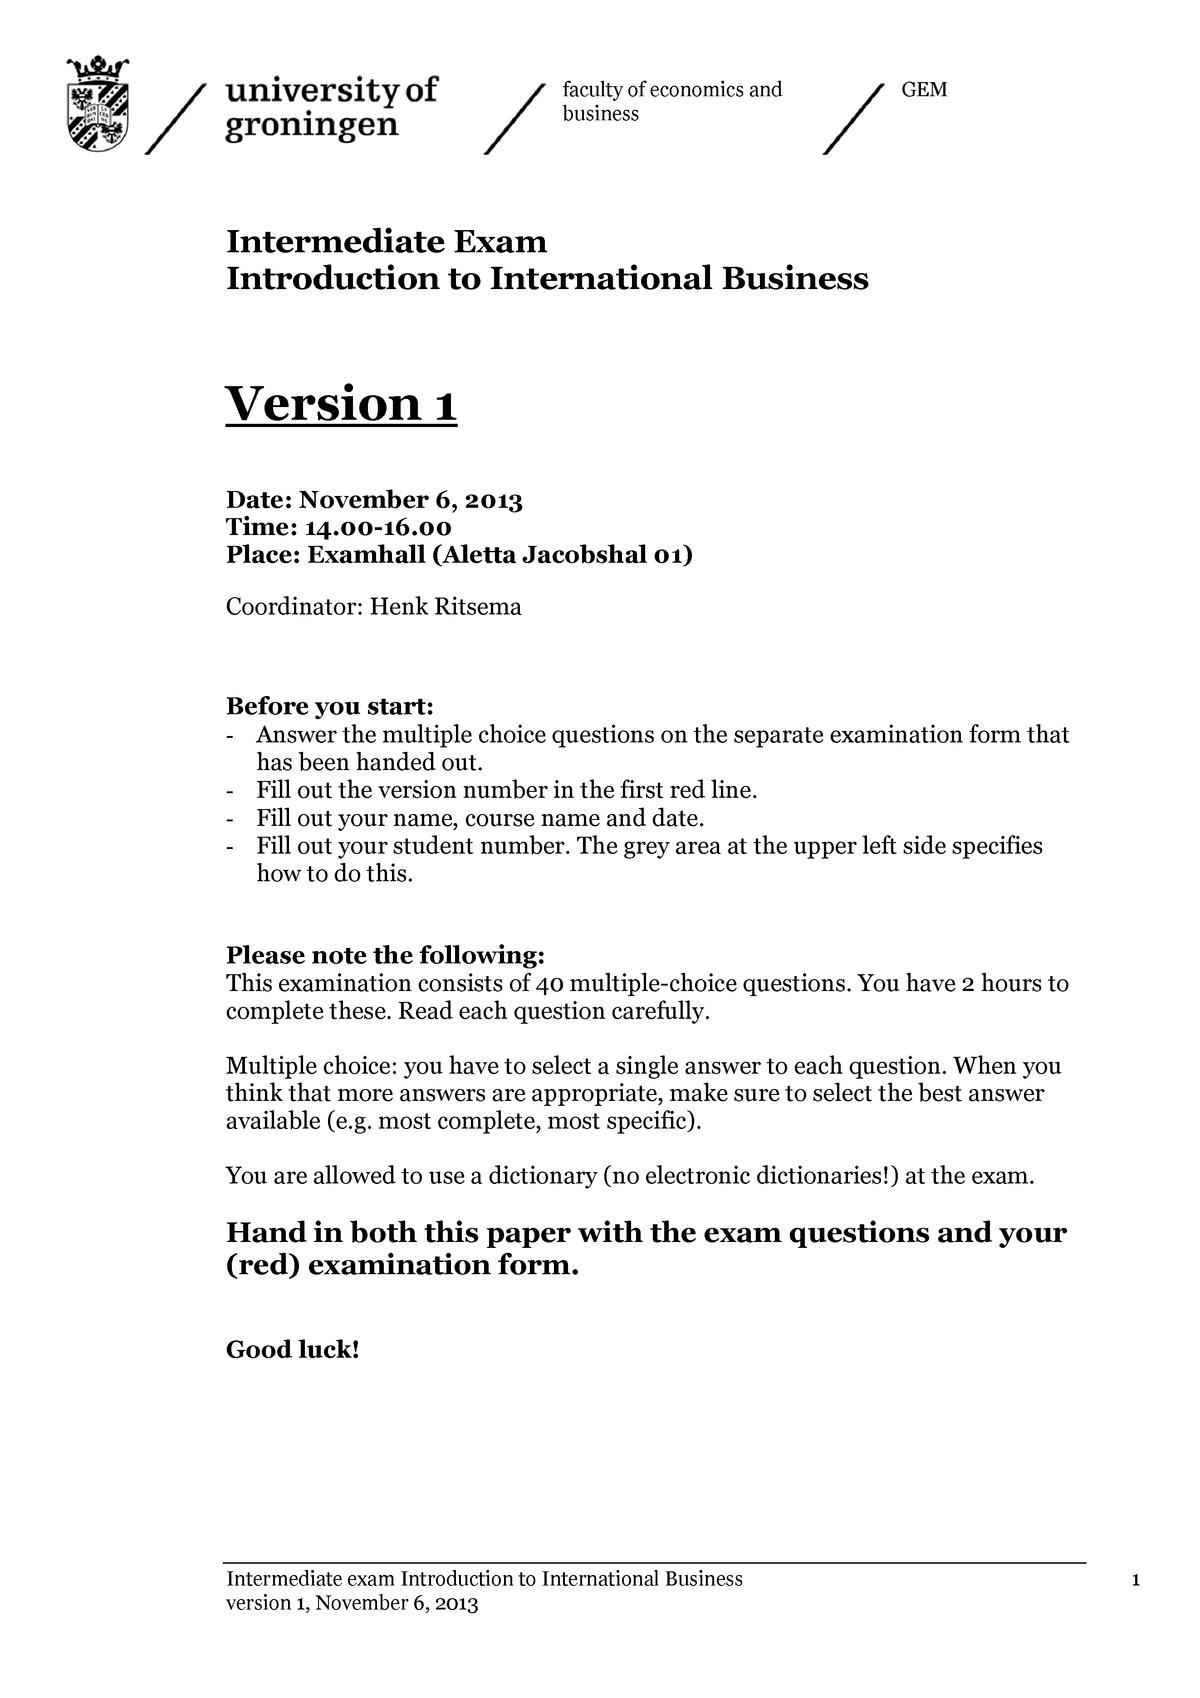 Tentamen 2013 - EBP003A05: Introduction to International Business